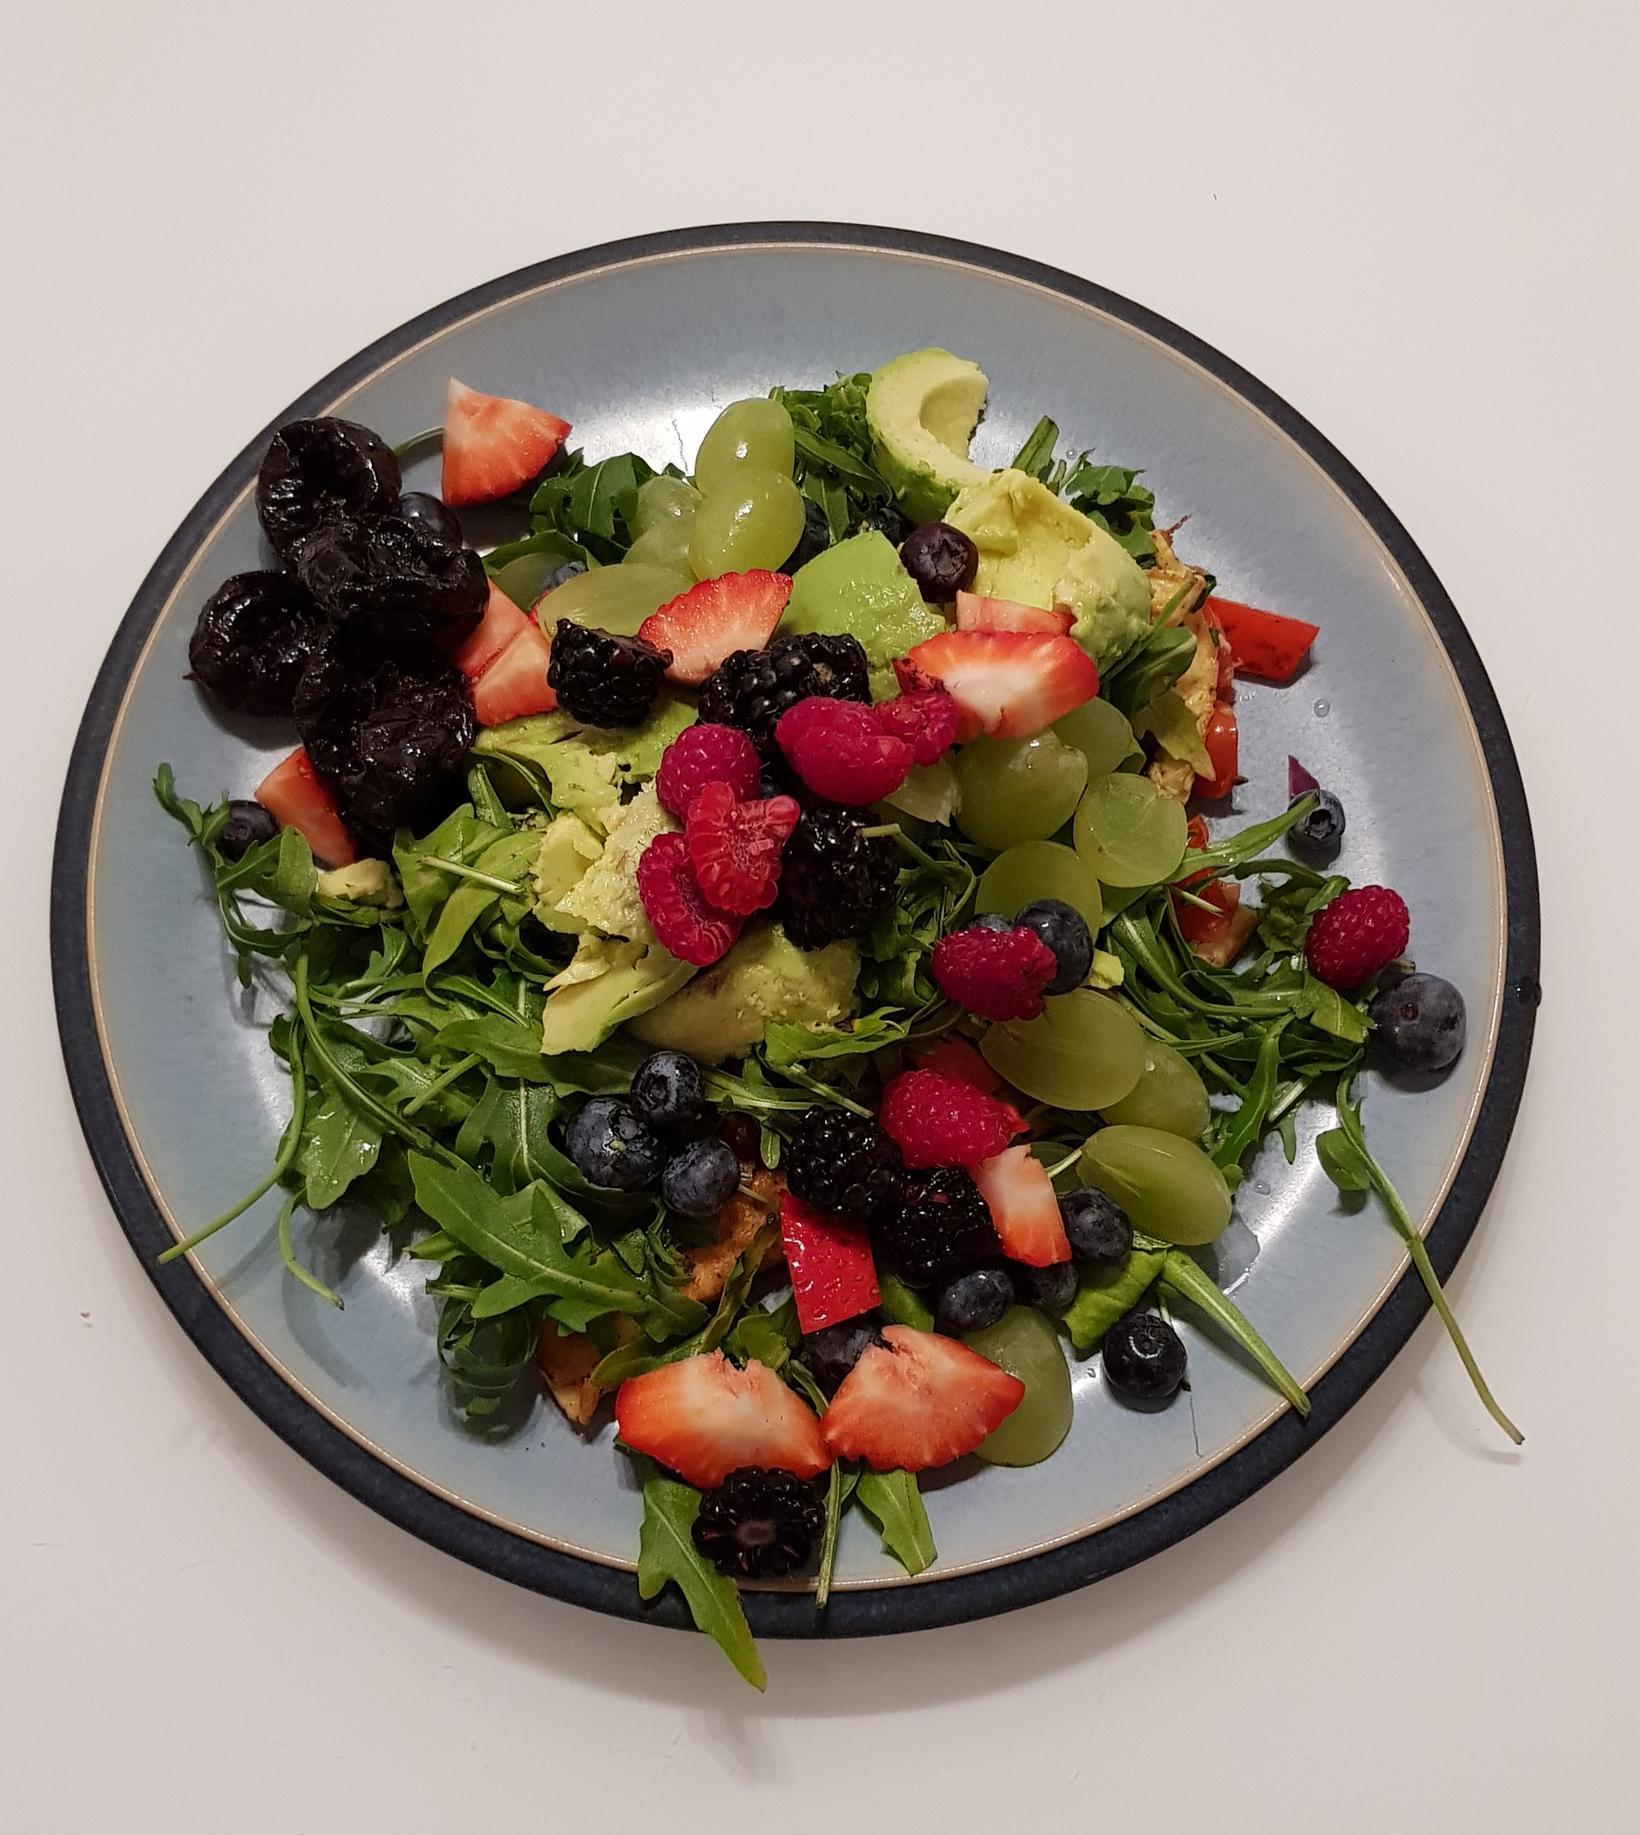 Er salat morgunmatur?